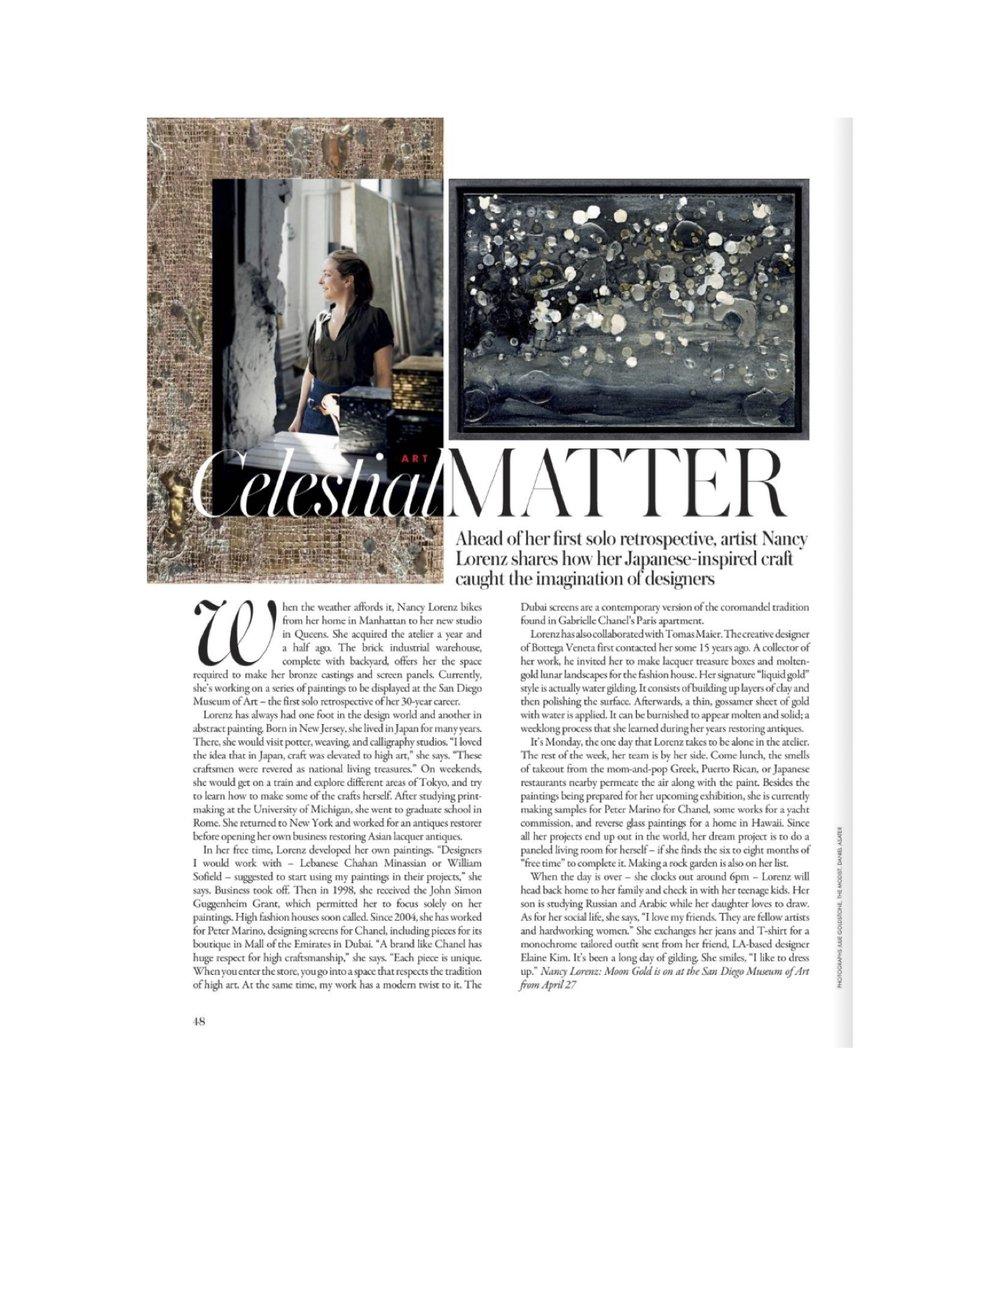 Vogue Arabia_03.01.18.jpg